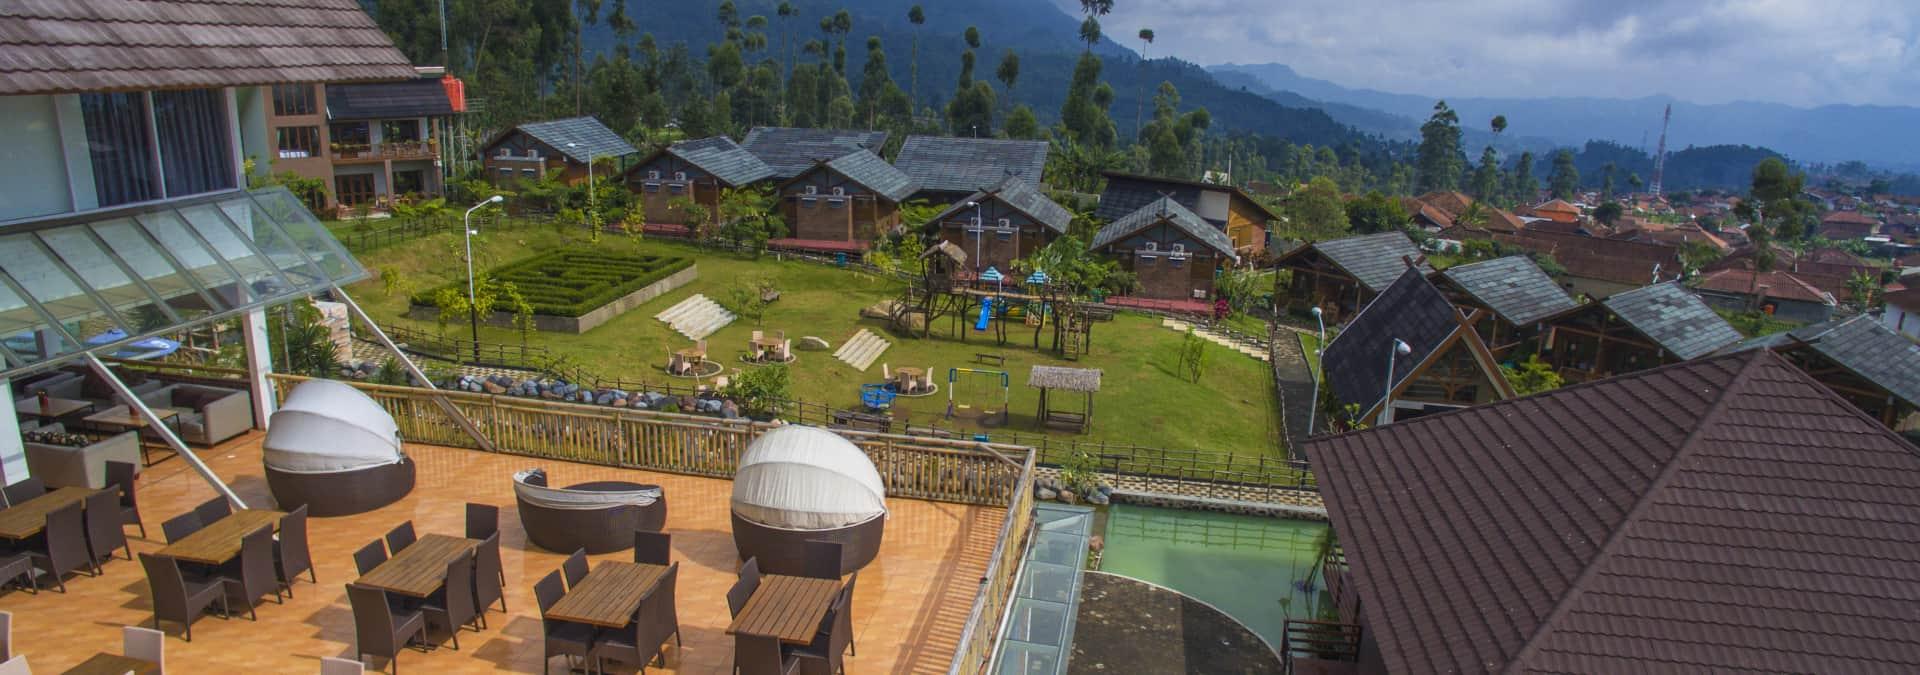 tempat wisata di bandung ciwidey valley resort